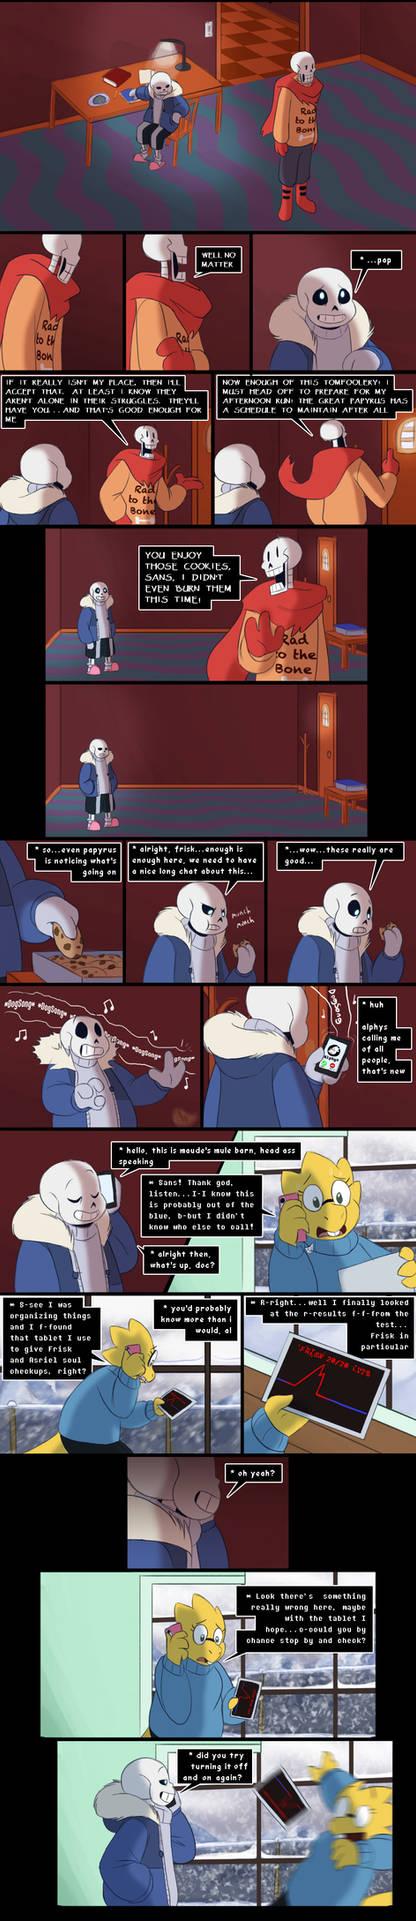 Endertale - Page 26